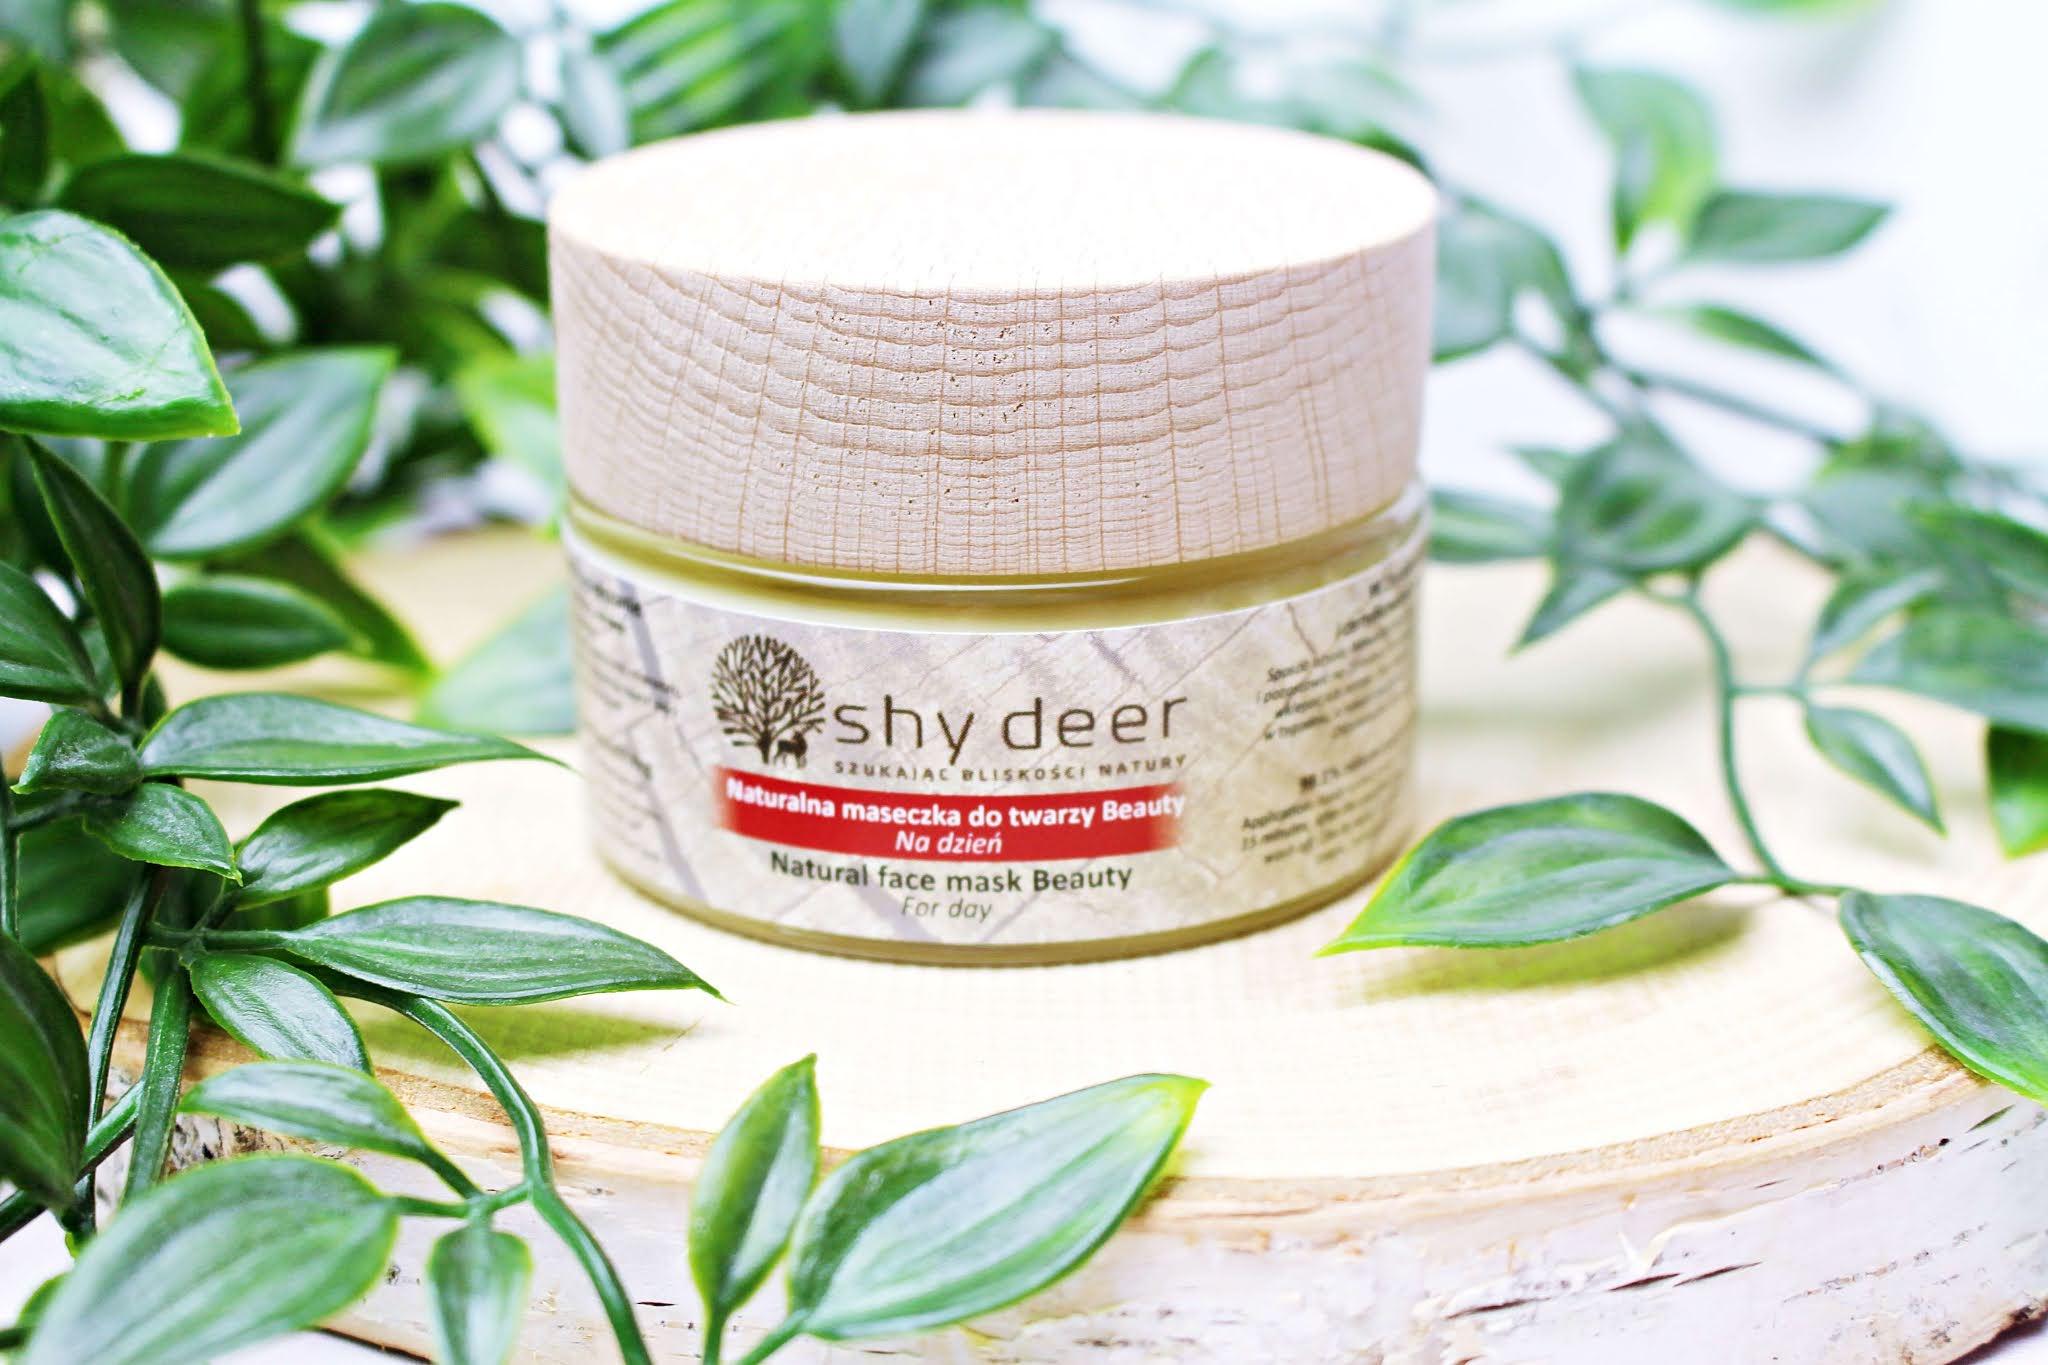 Shy Deer Naturalna maseczka do twarzy Beauty